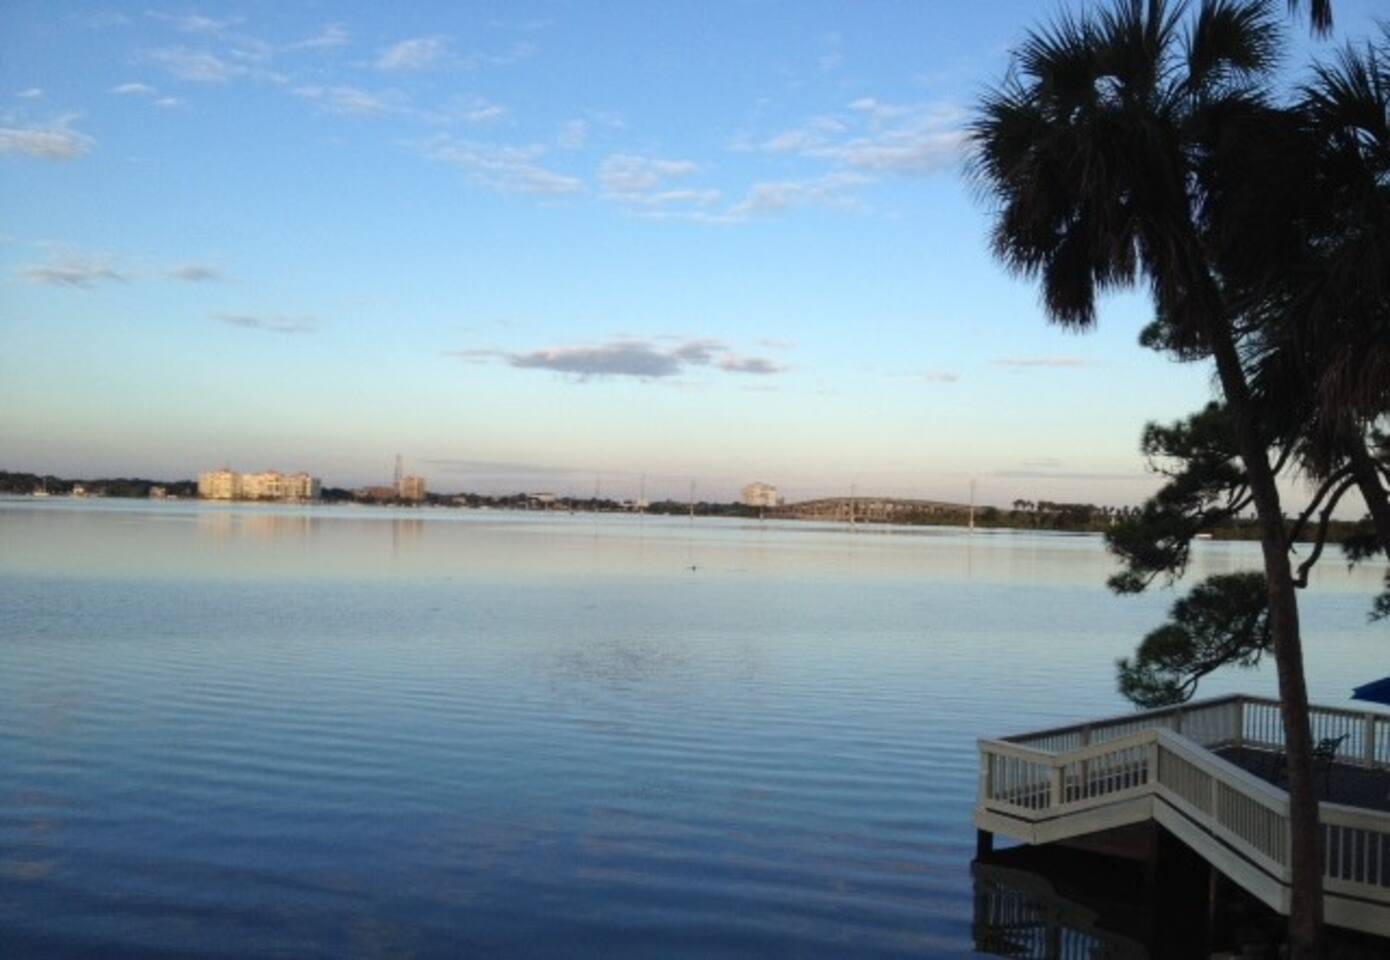 Rental on Indian River (Sunset Bay)